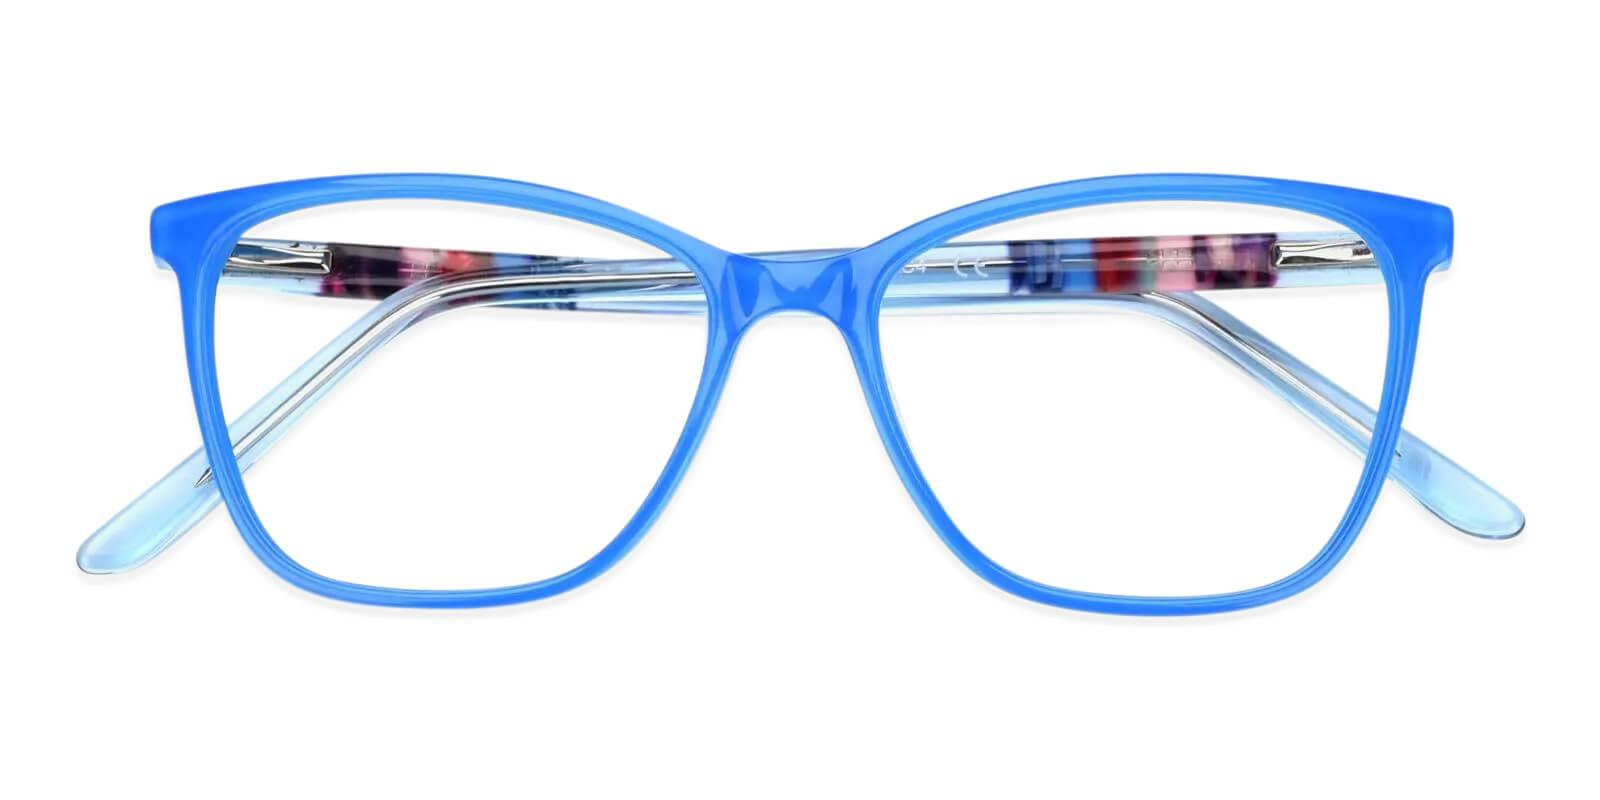 Mitchell Blue Acetate Eyeglasses , Fashion , SpringHinges , UniversalBridgeFit Frames from ABBE Glasses